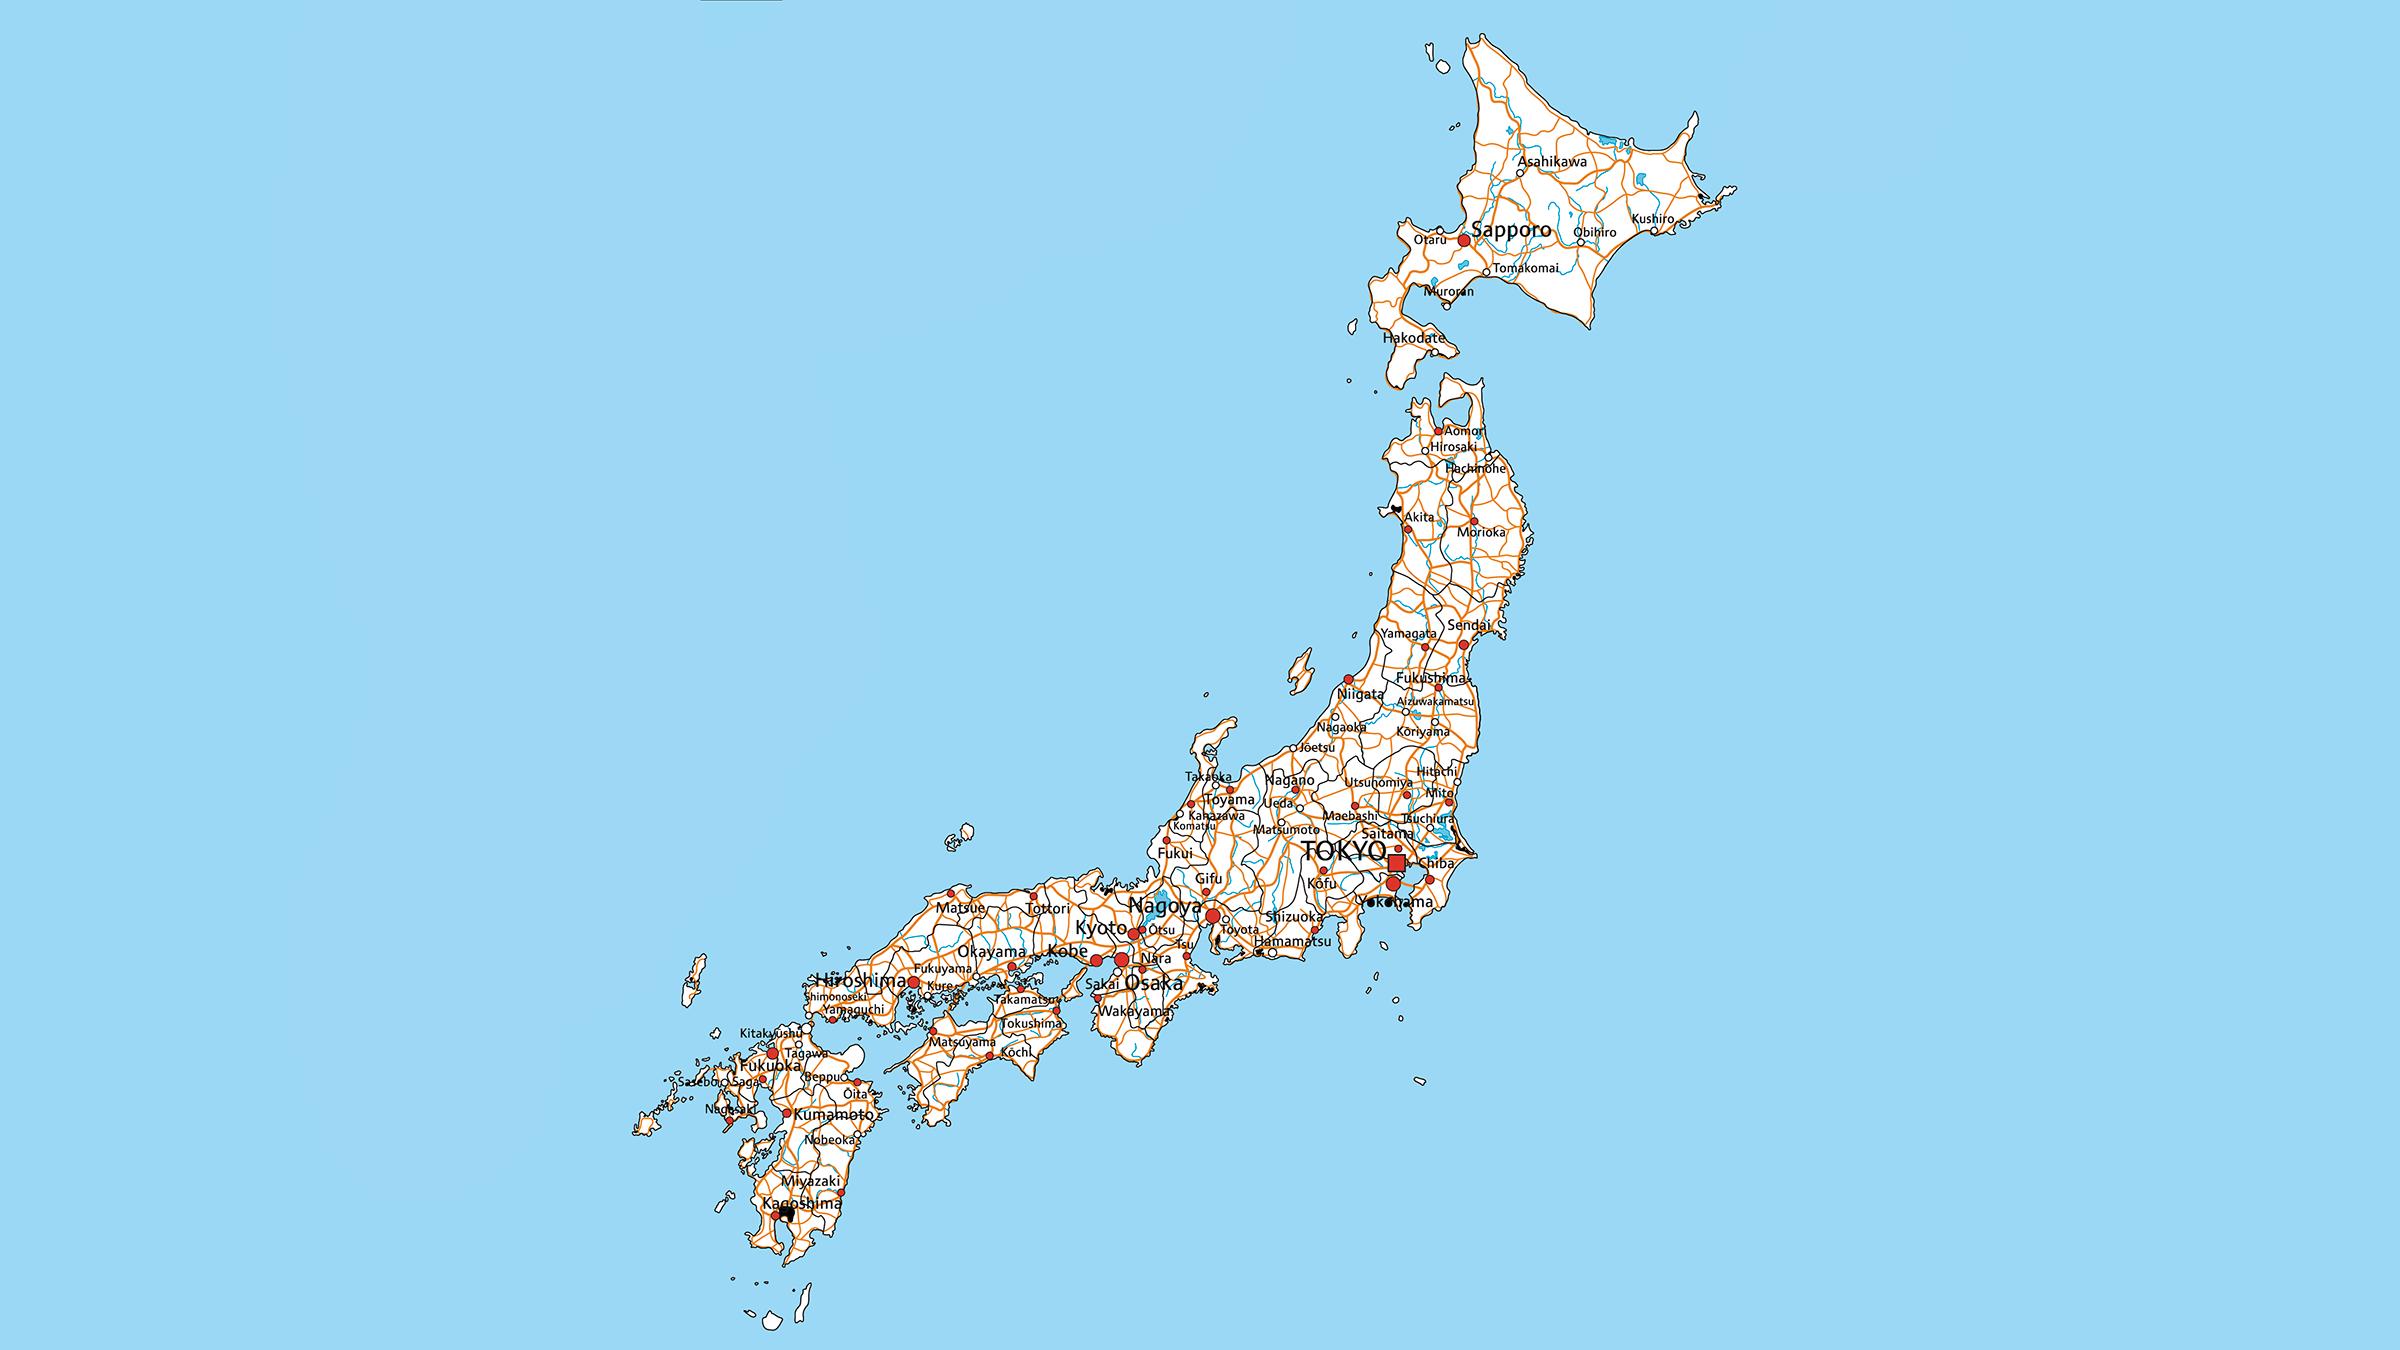 mapa-carreteras-japon.jpg